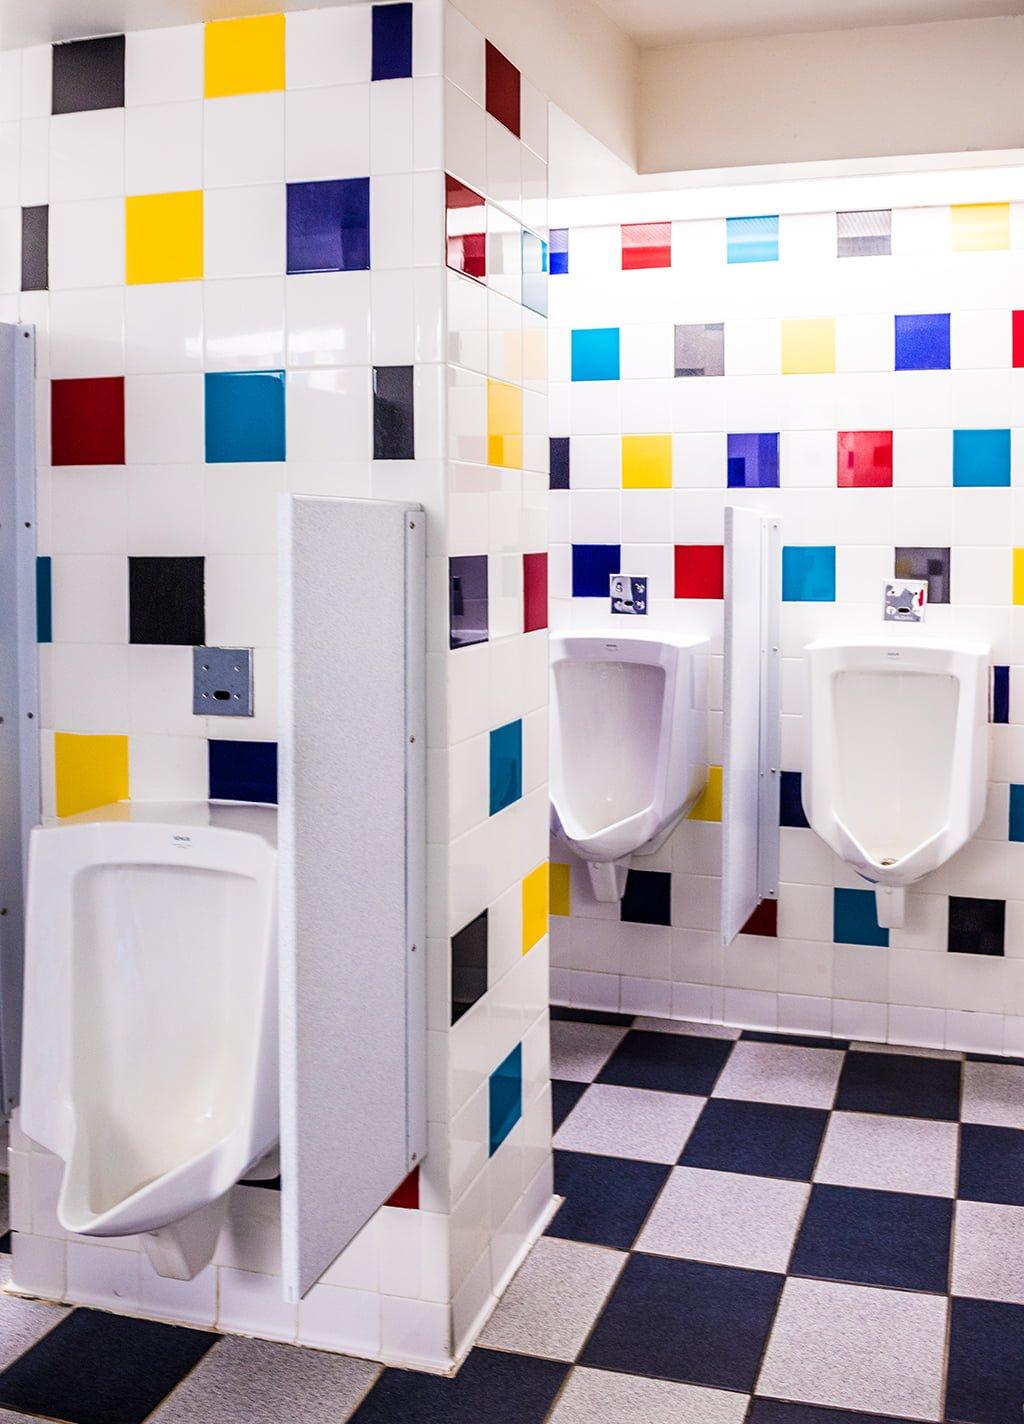 Top 10 Toilets At Disney World Disney Tourist Blog